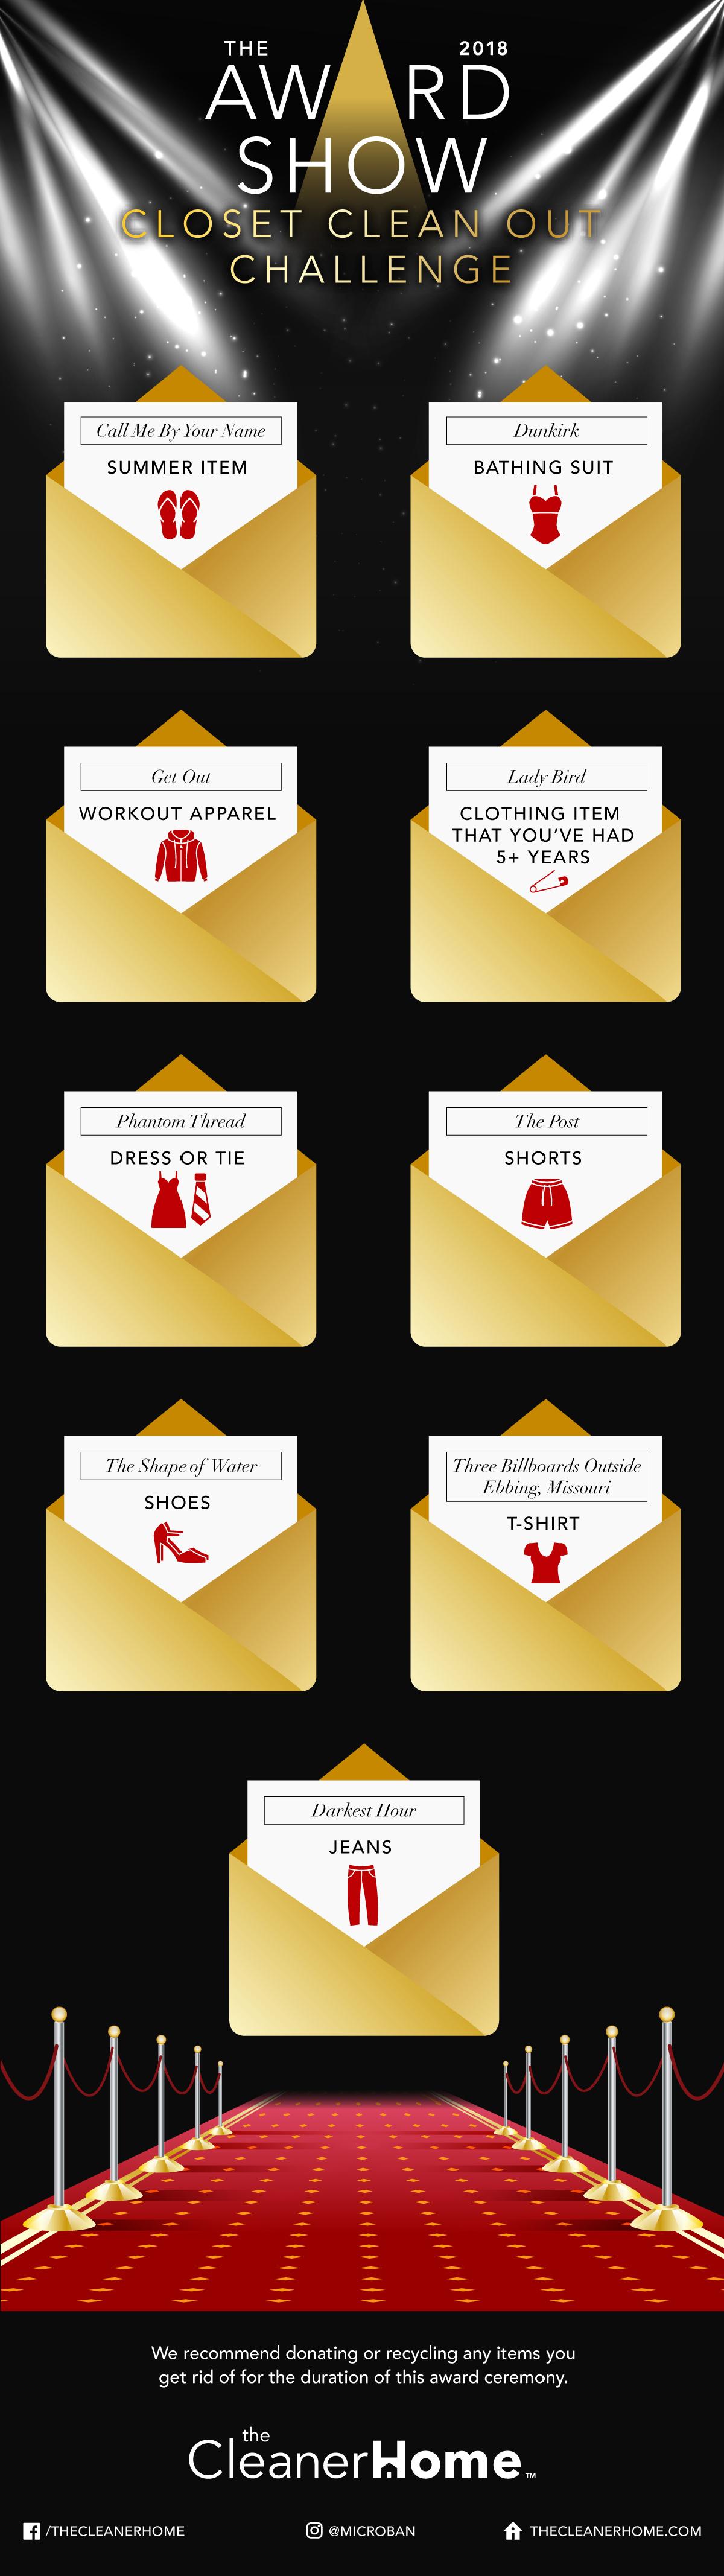 Oscars Clean Closet Challenge Infographic